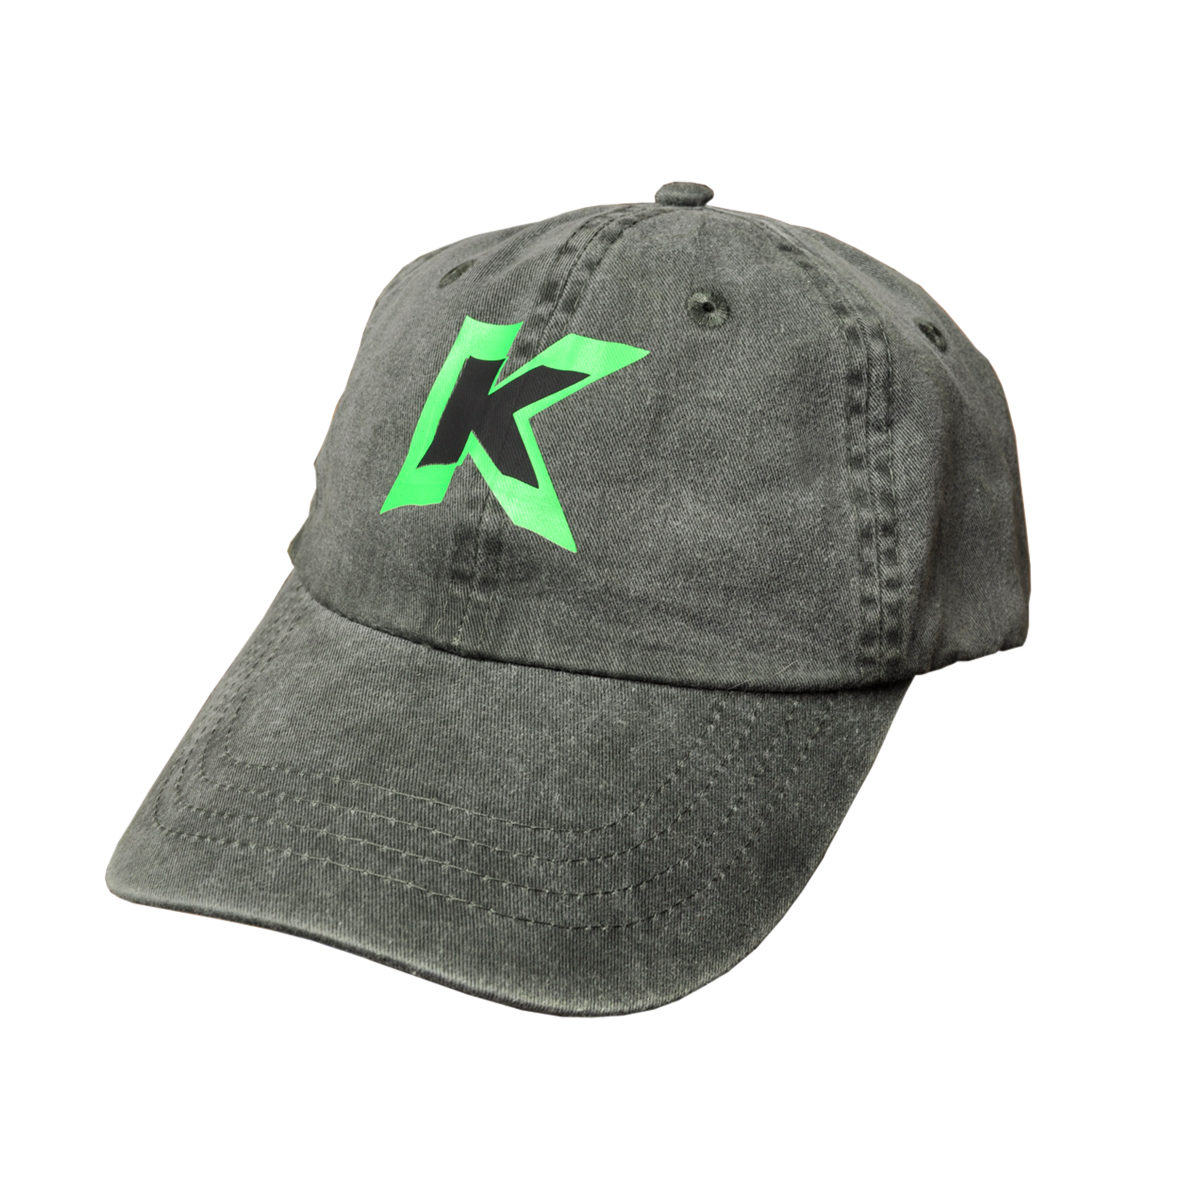 kishels scents logo hat